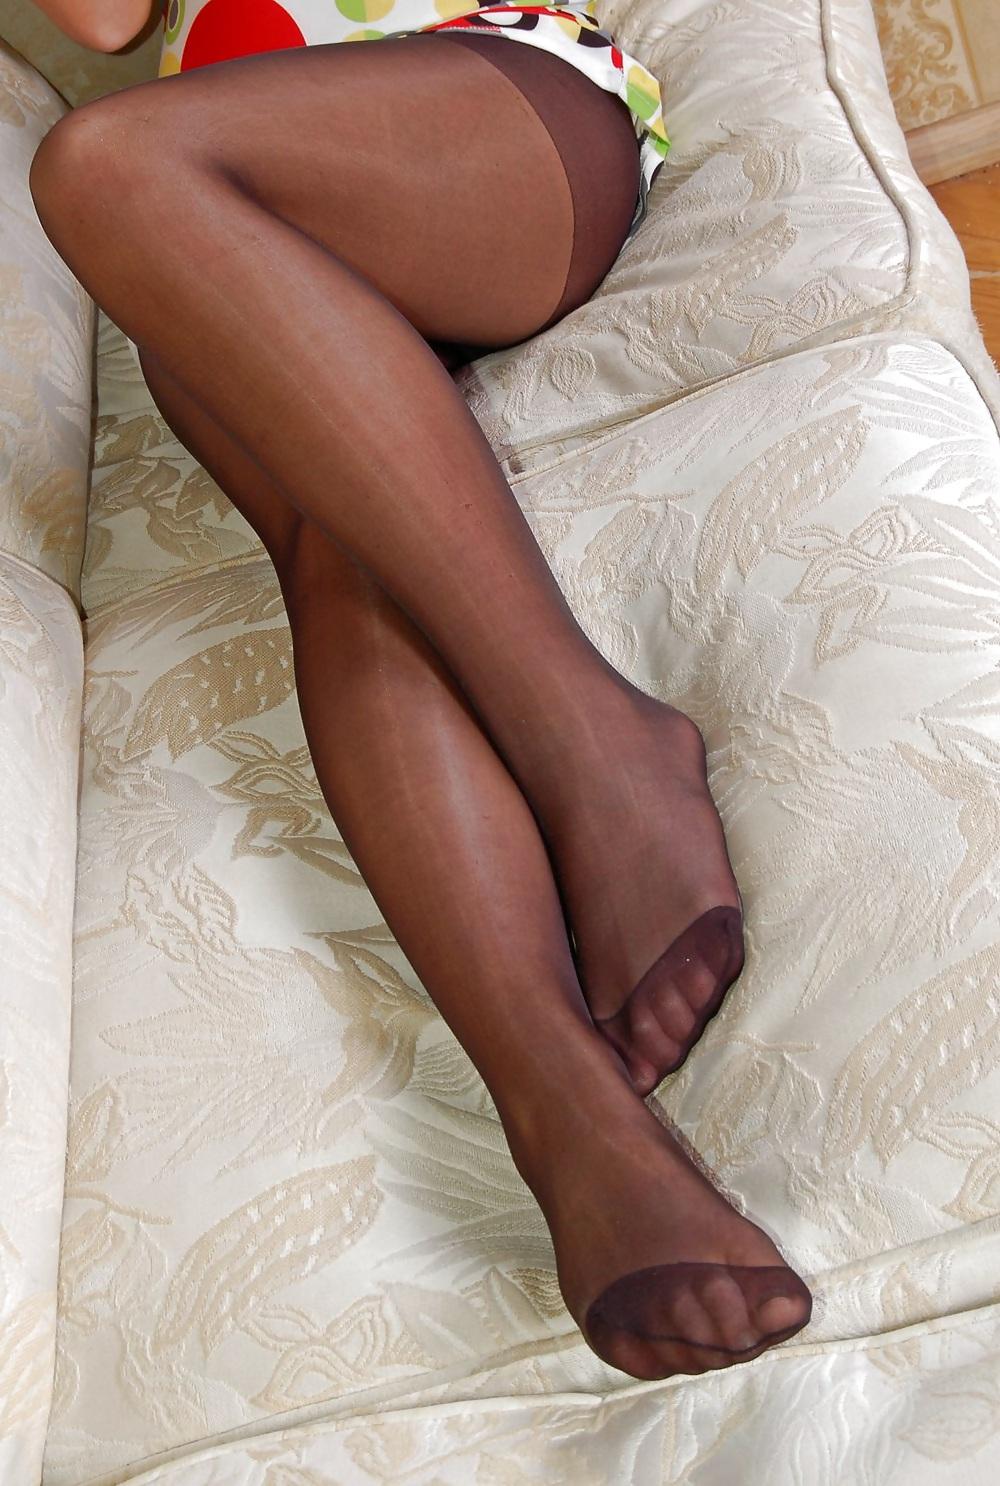 Free Amateur Woman shows Pantyhosefeet photos